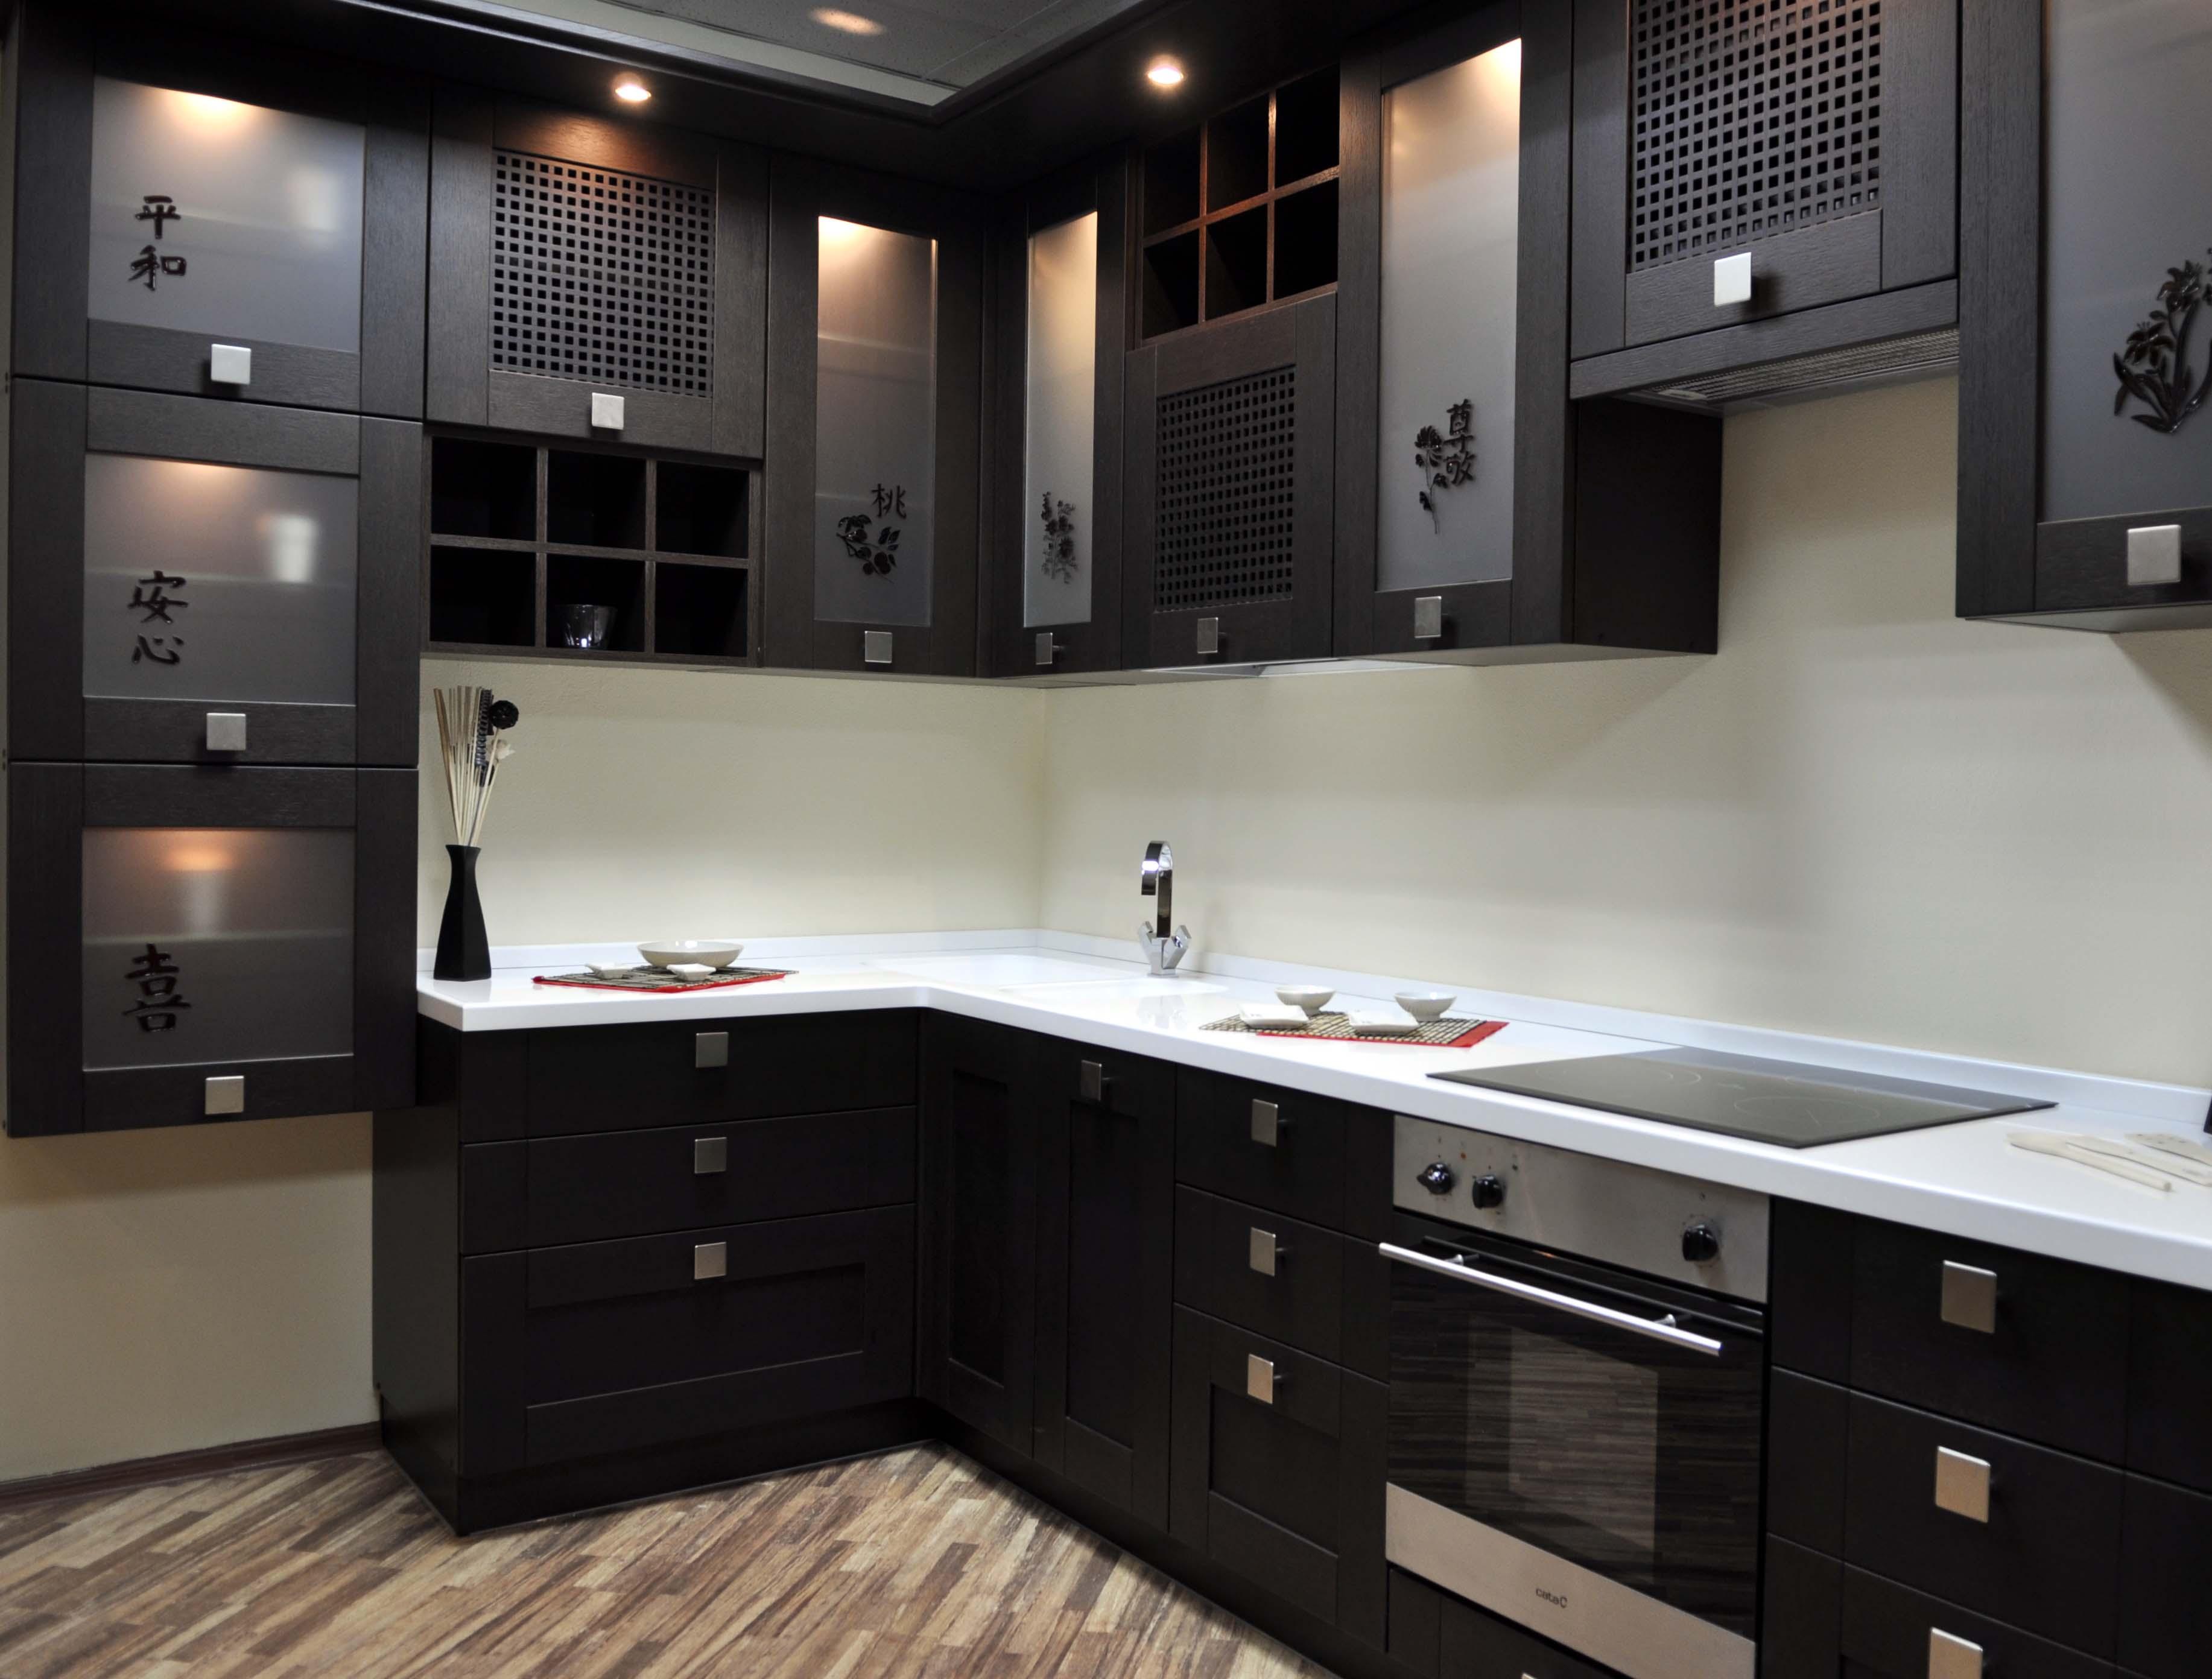 nécessaire_furniture_in_the_kitchen-04